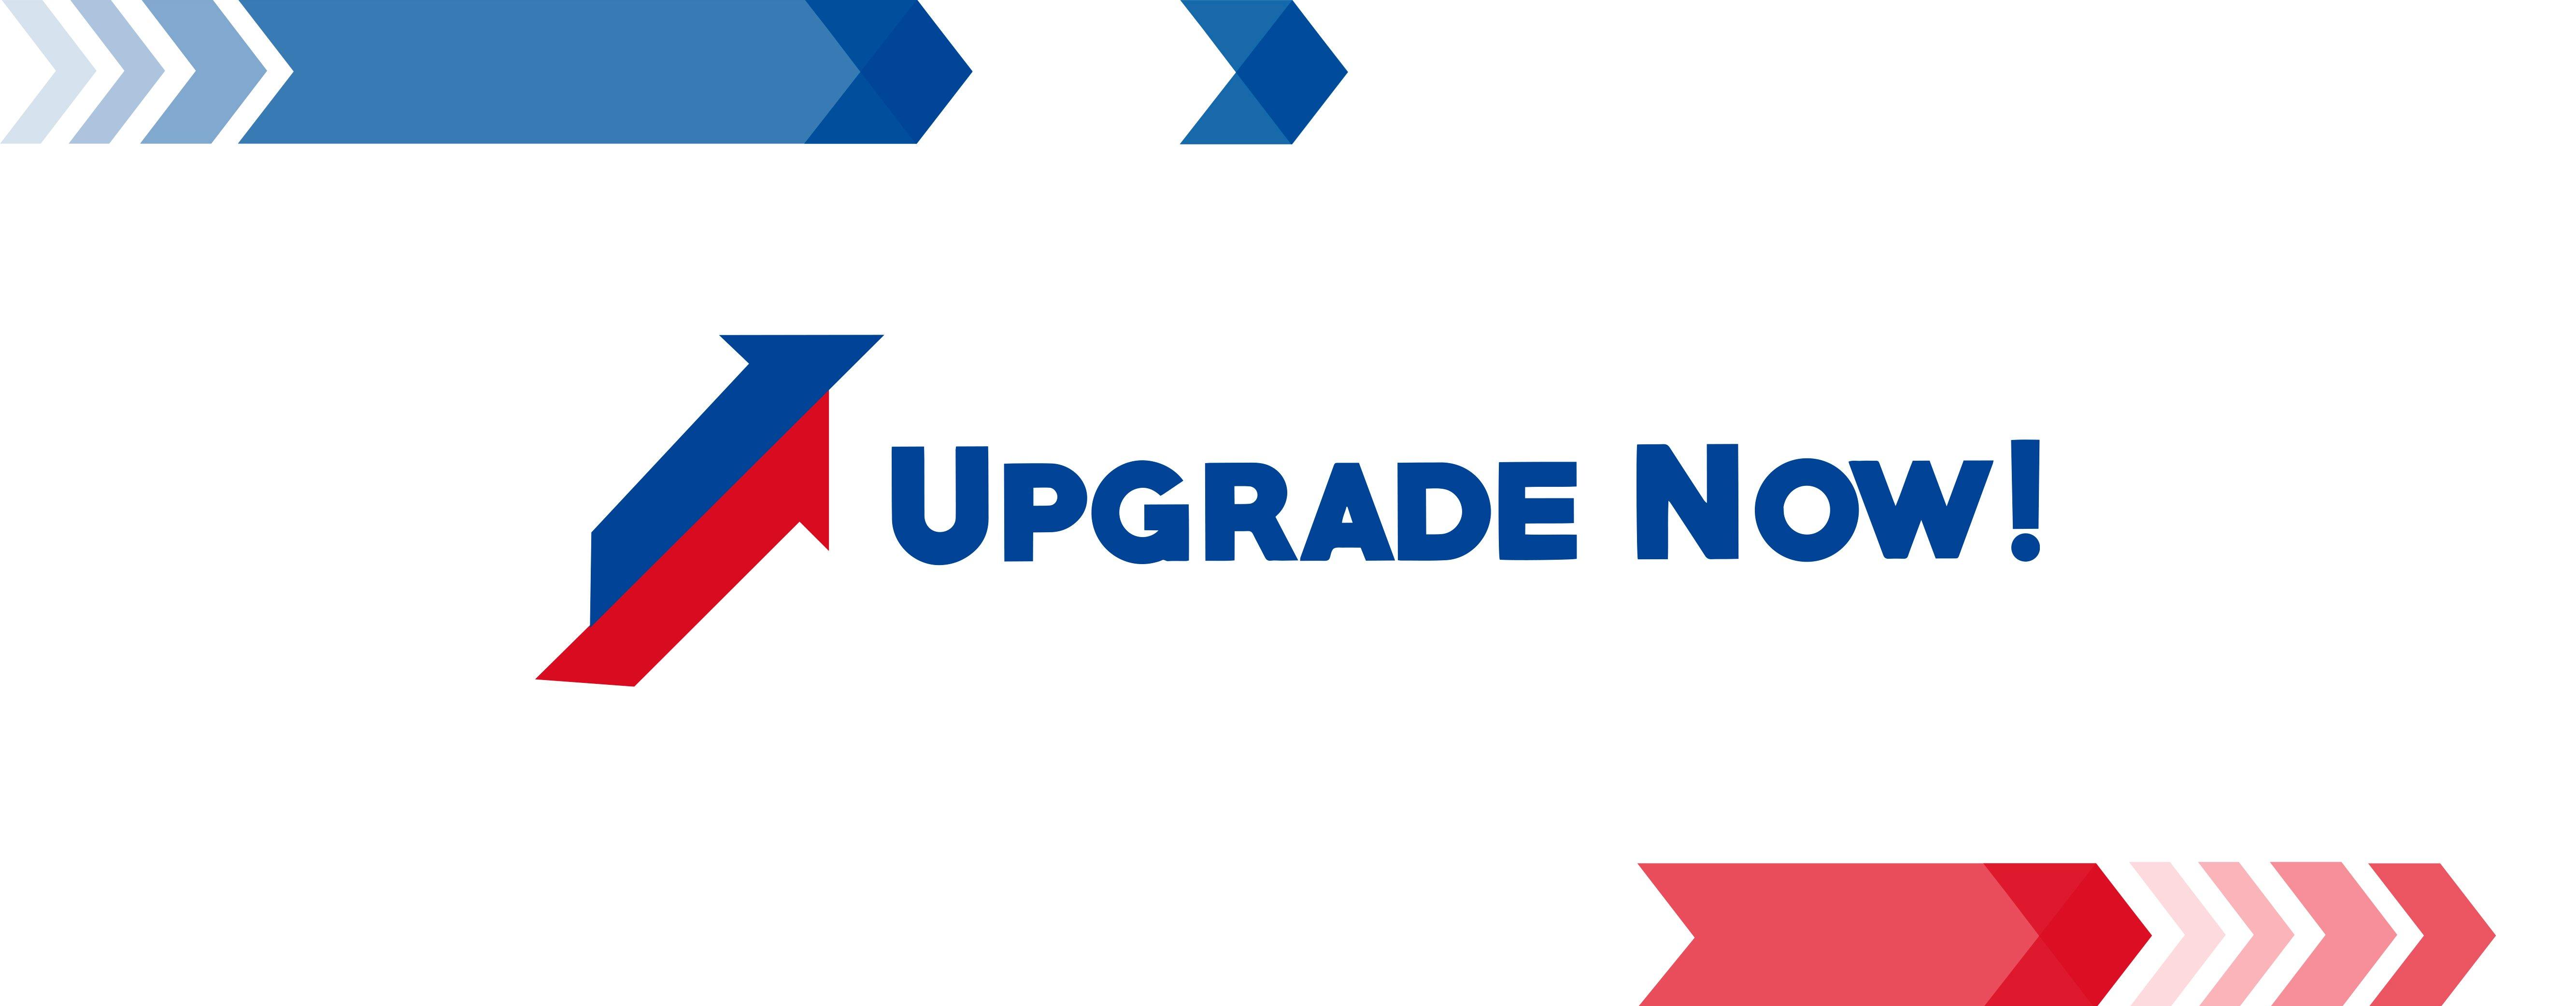 upgrade-now-veracruz-portada